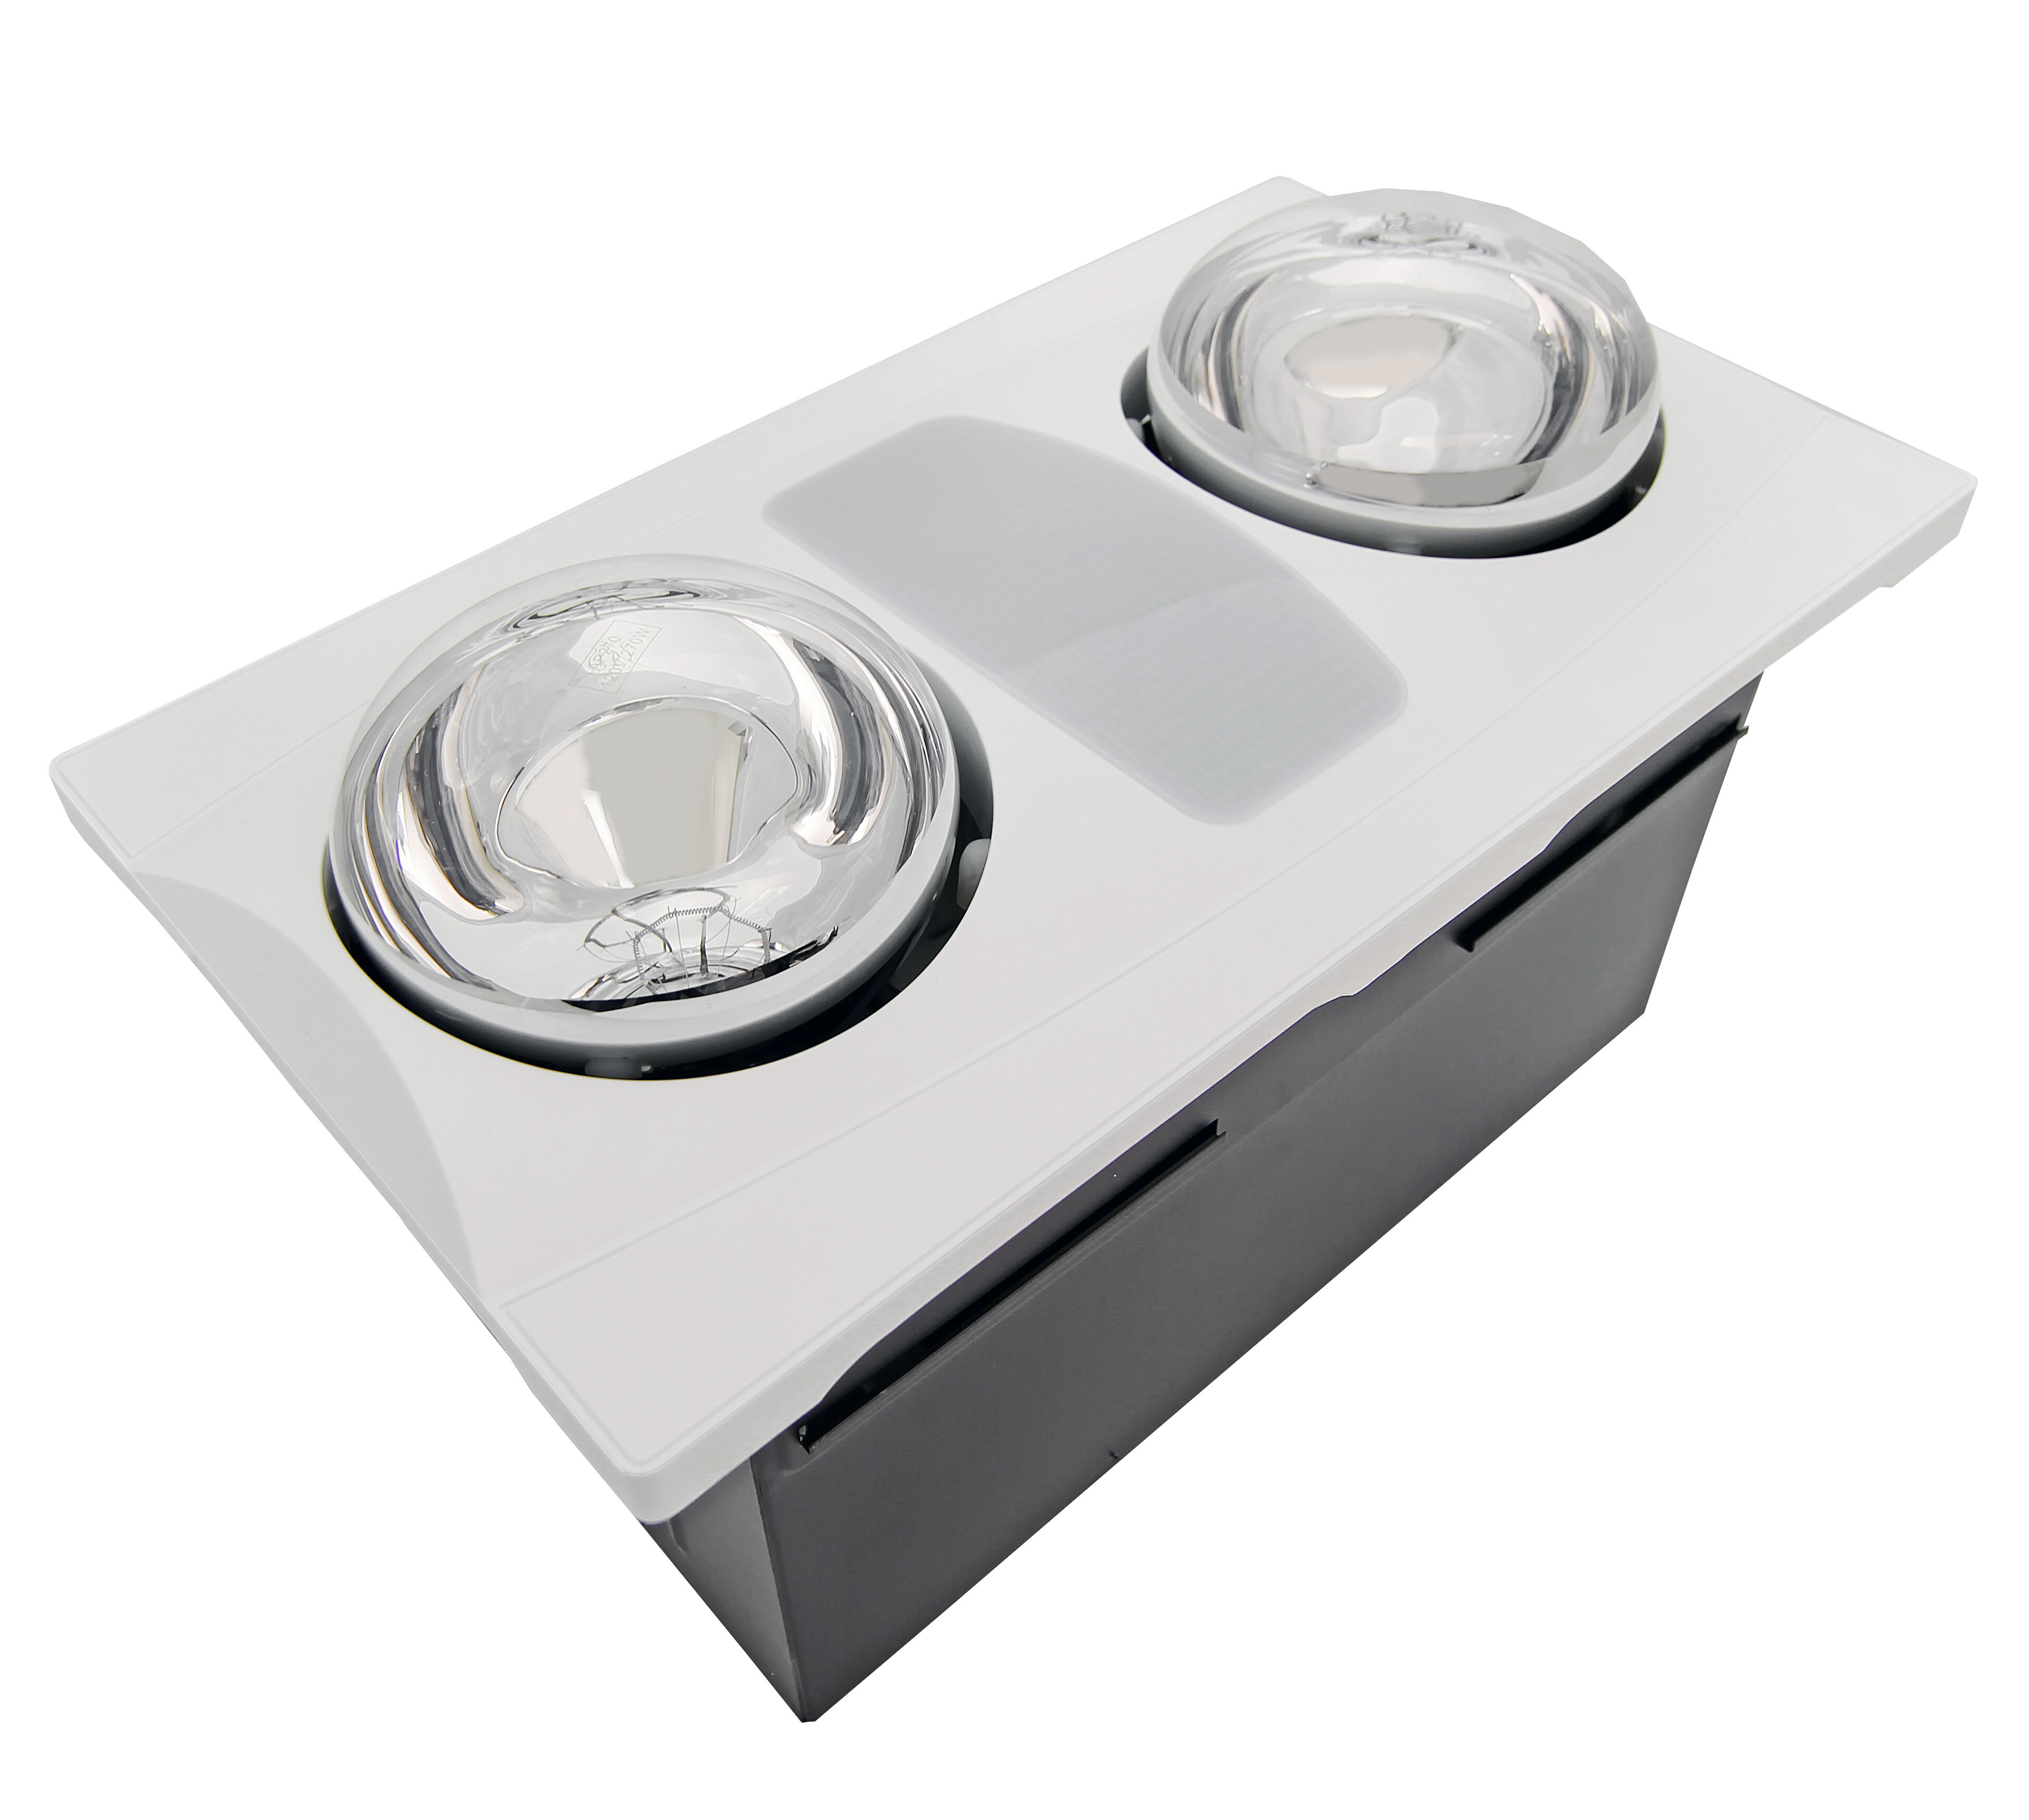 Aero Pure 80 Cfm Bathroom Fan With Heater And Light Reviews Wayfair